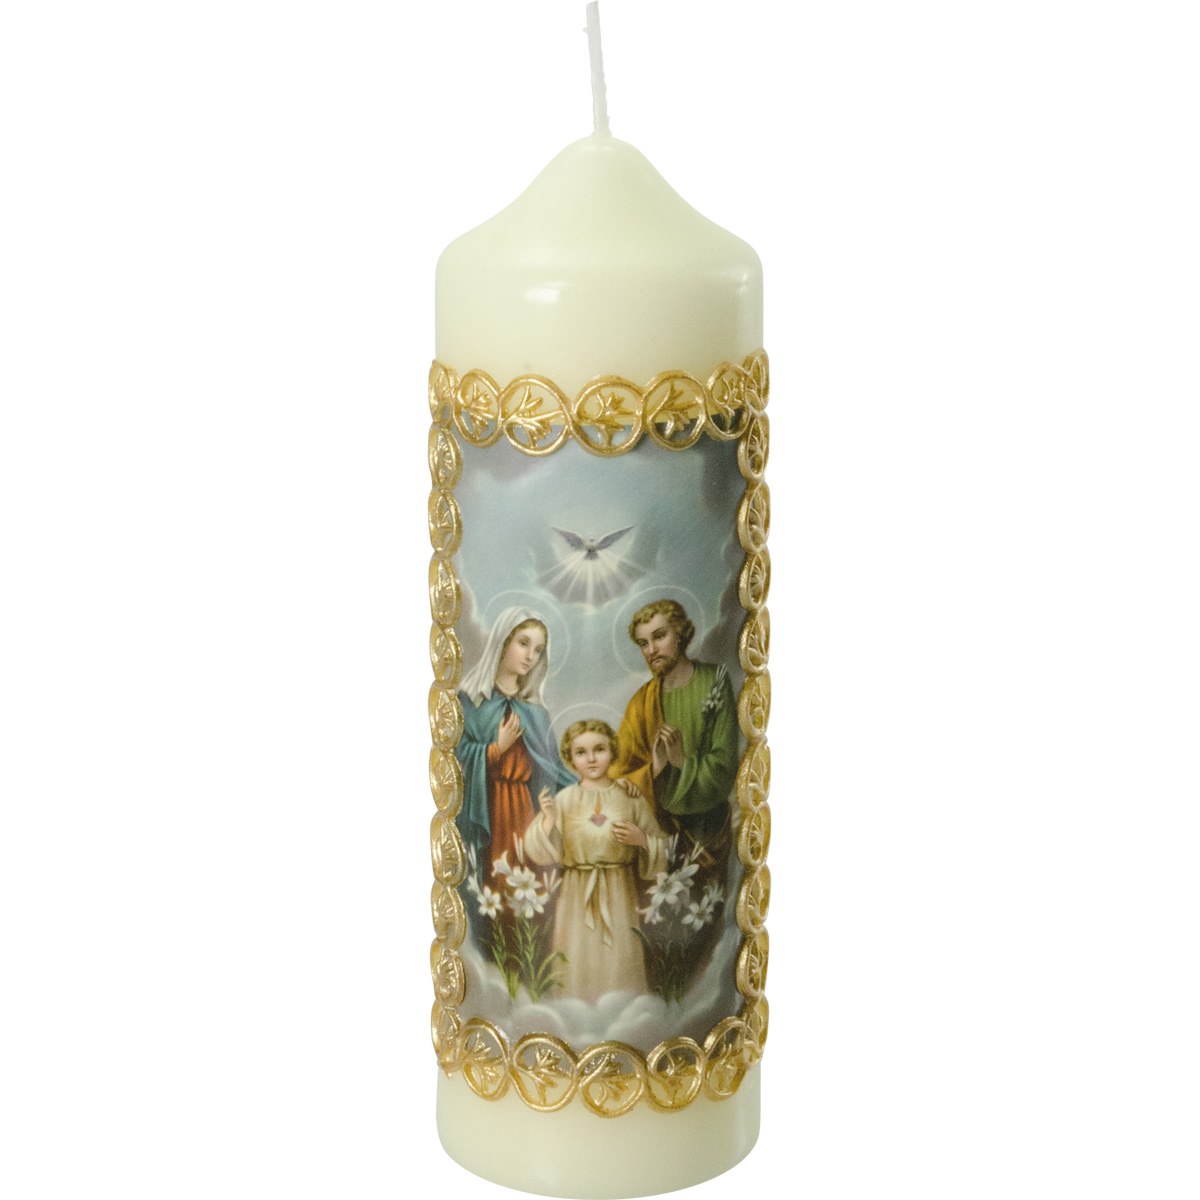 Heilige Familie Kerze, #812-K, 165x50, Fotodruck, Wachsborte